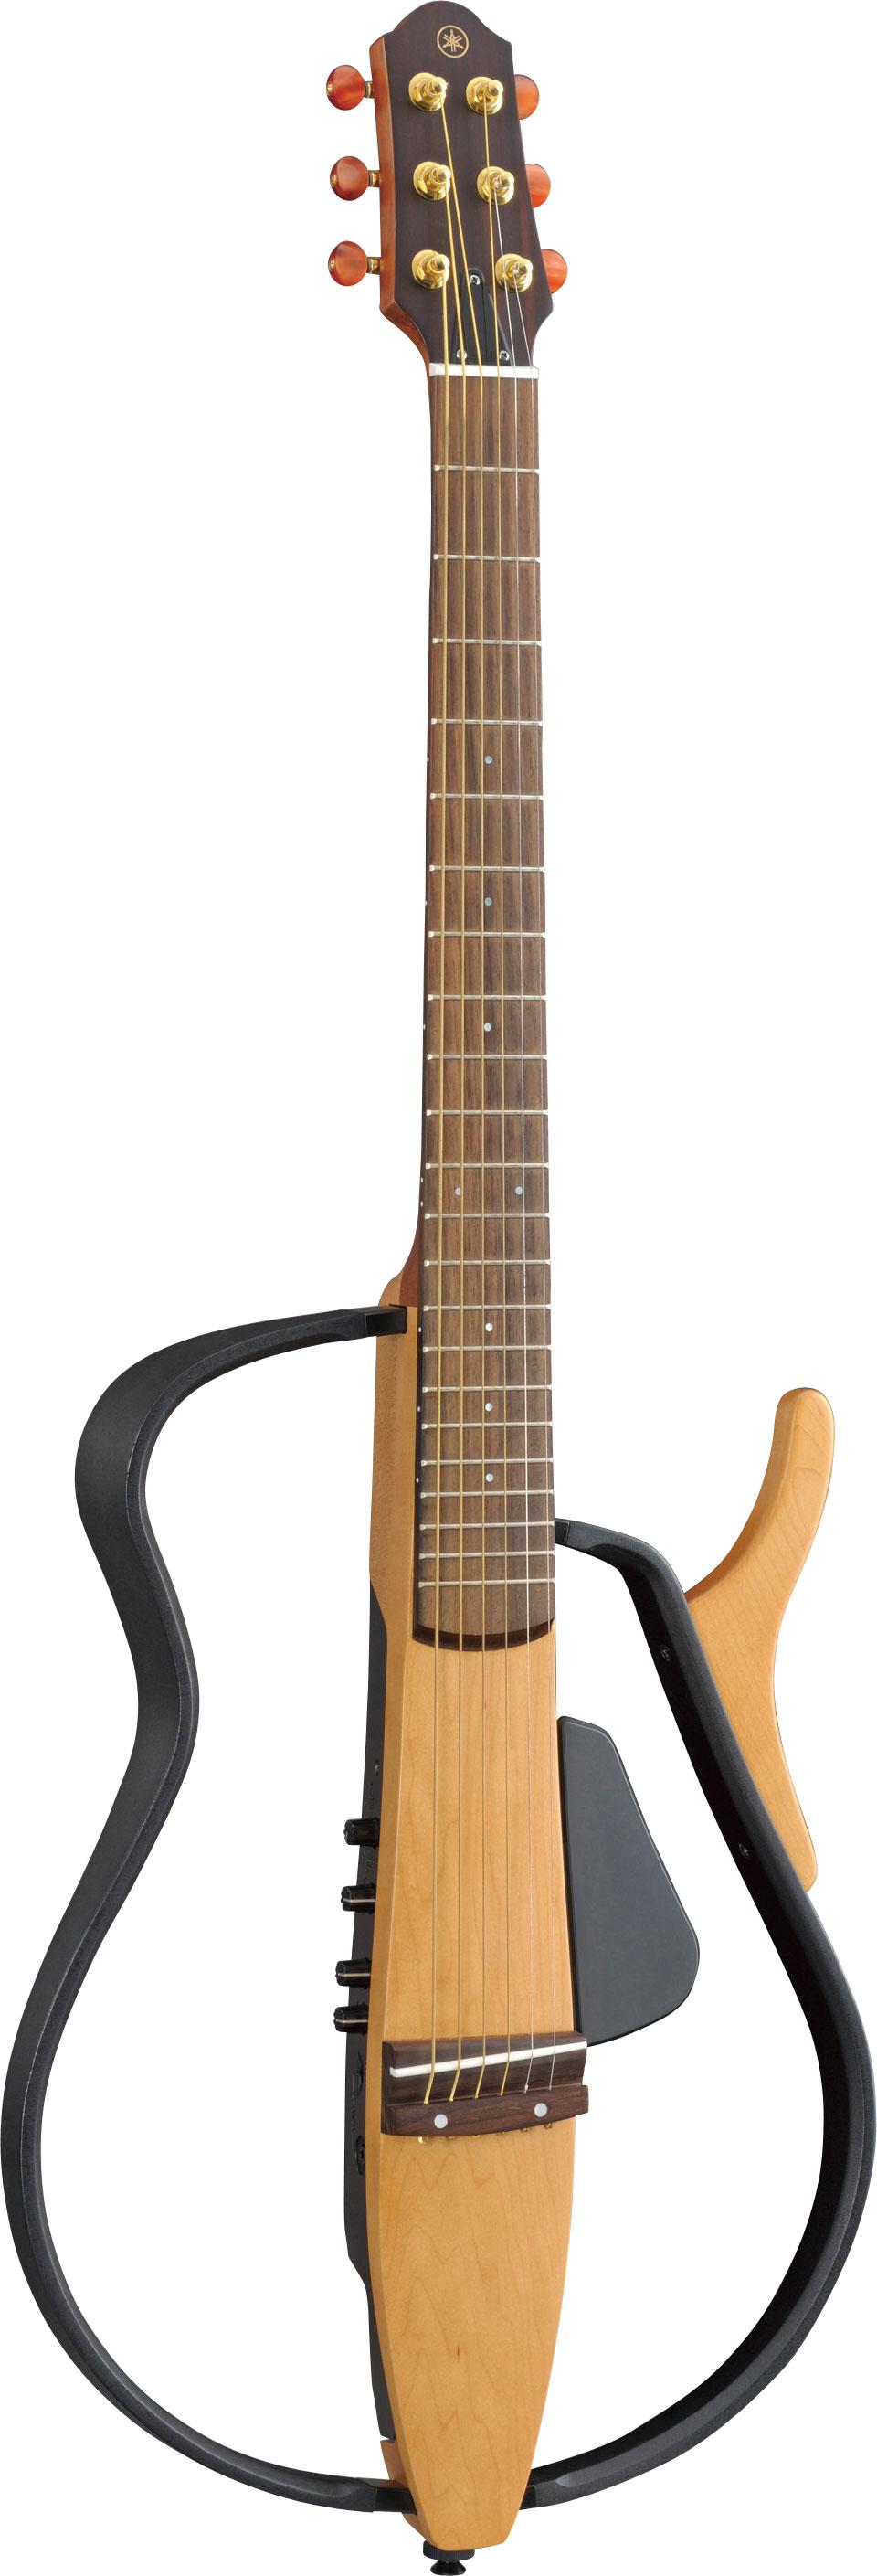 kurnia musik semarang yamaha slg110s silent guitar string. Black Bedroom Furniture Sets. Home Design Ideas